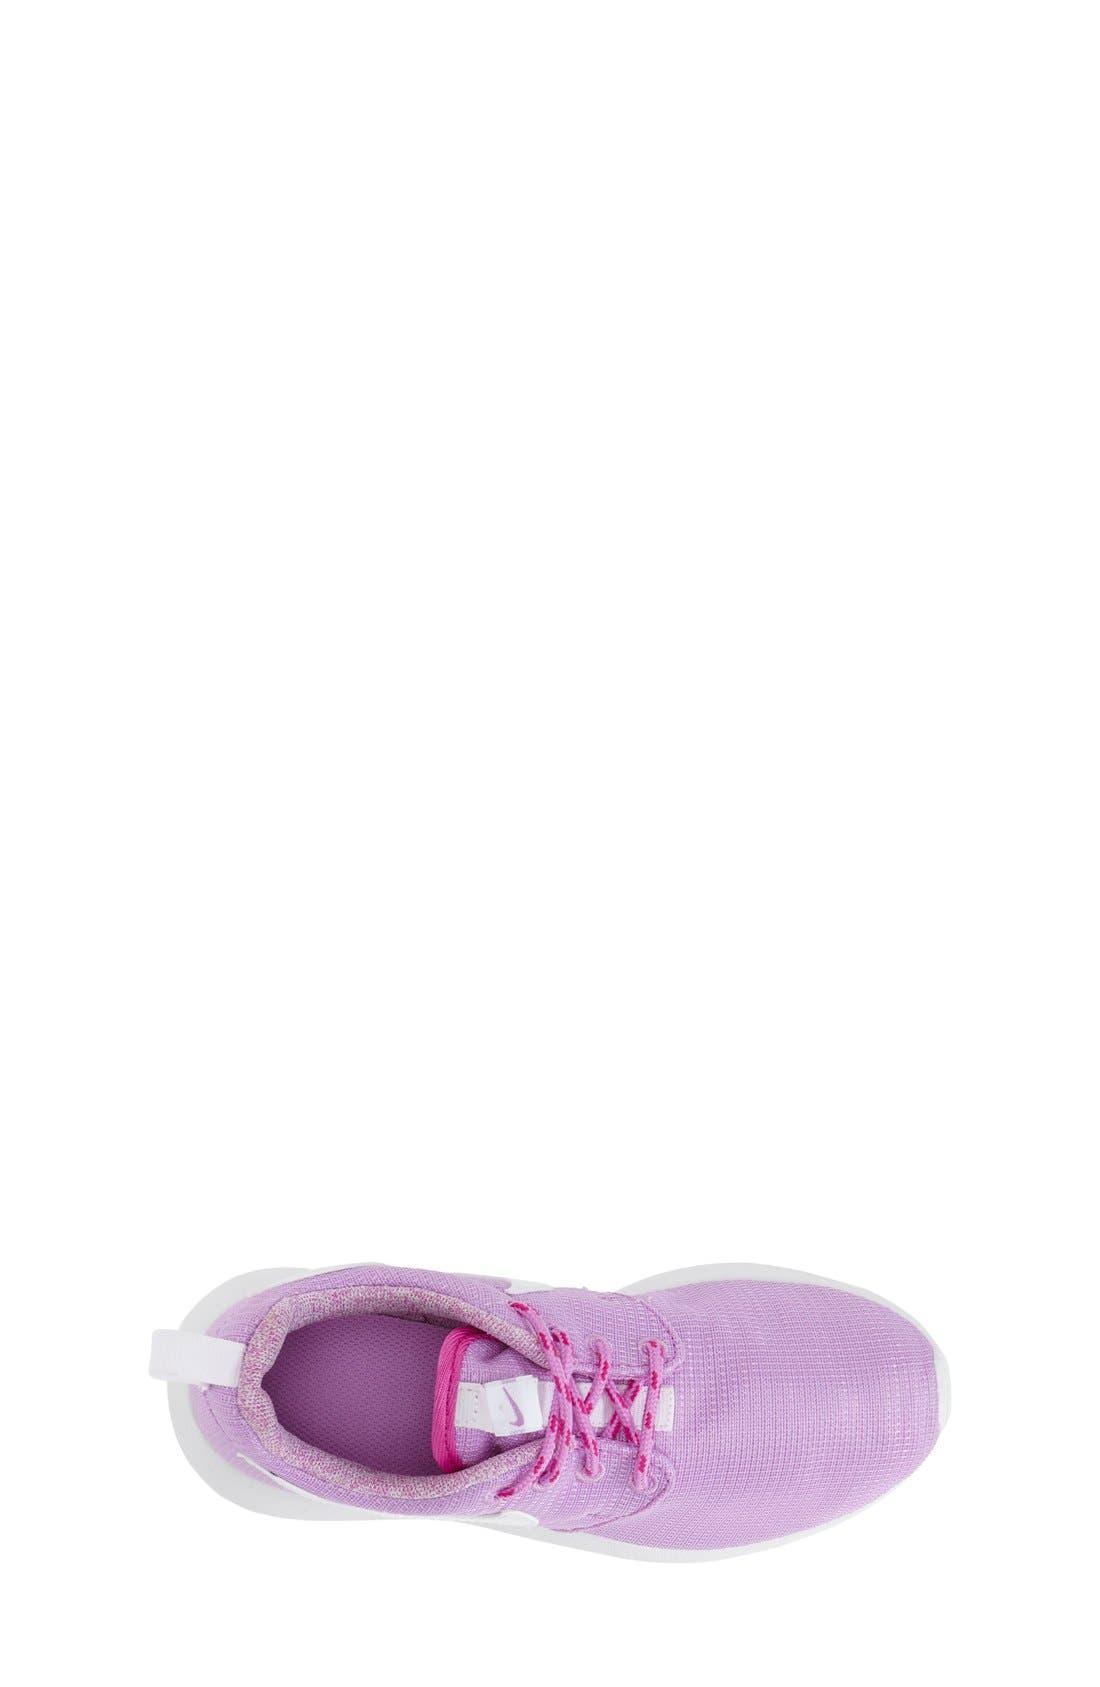 'Roshe Run' Athletic Shoe,                             Alternate thumbnail 137, color,